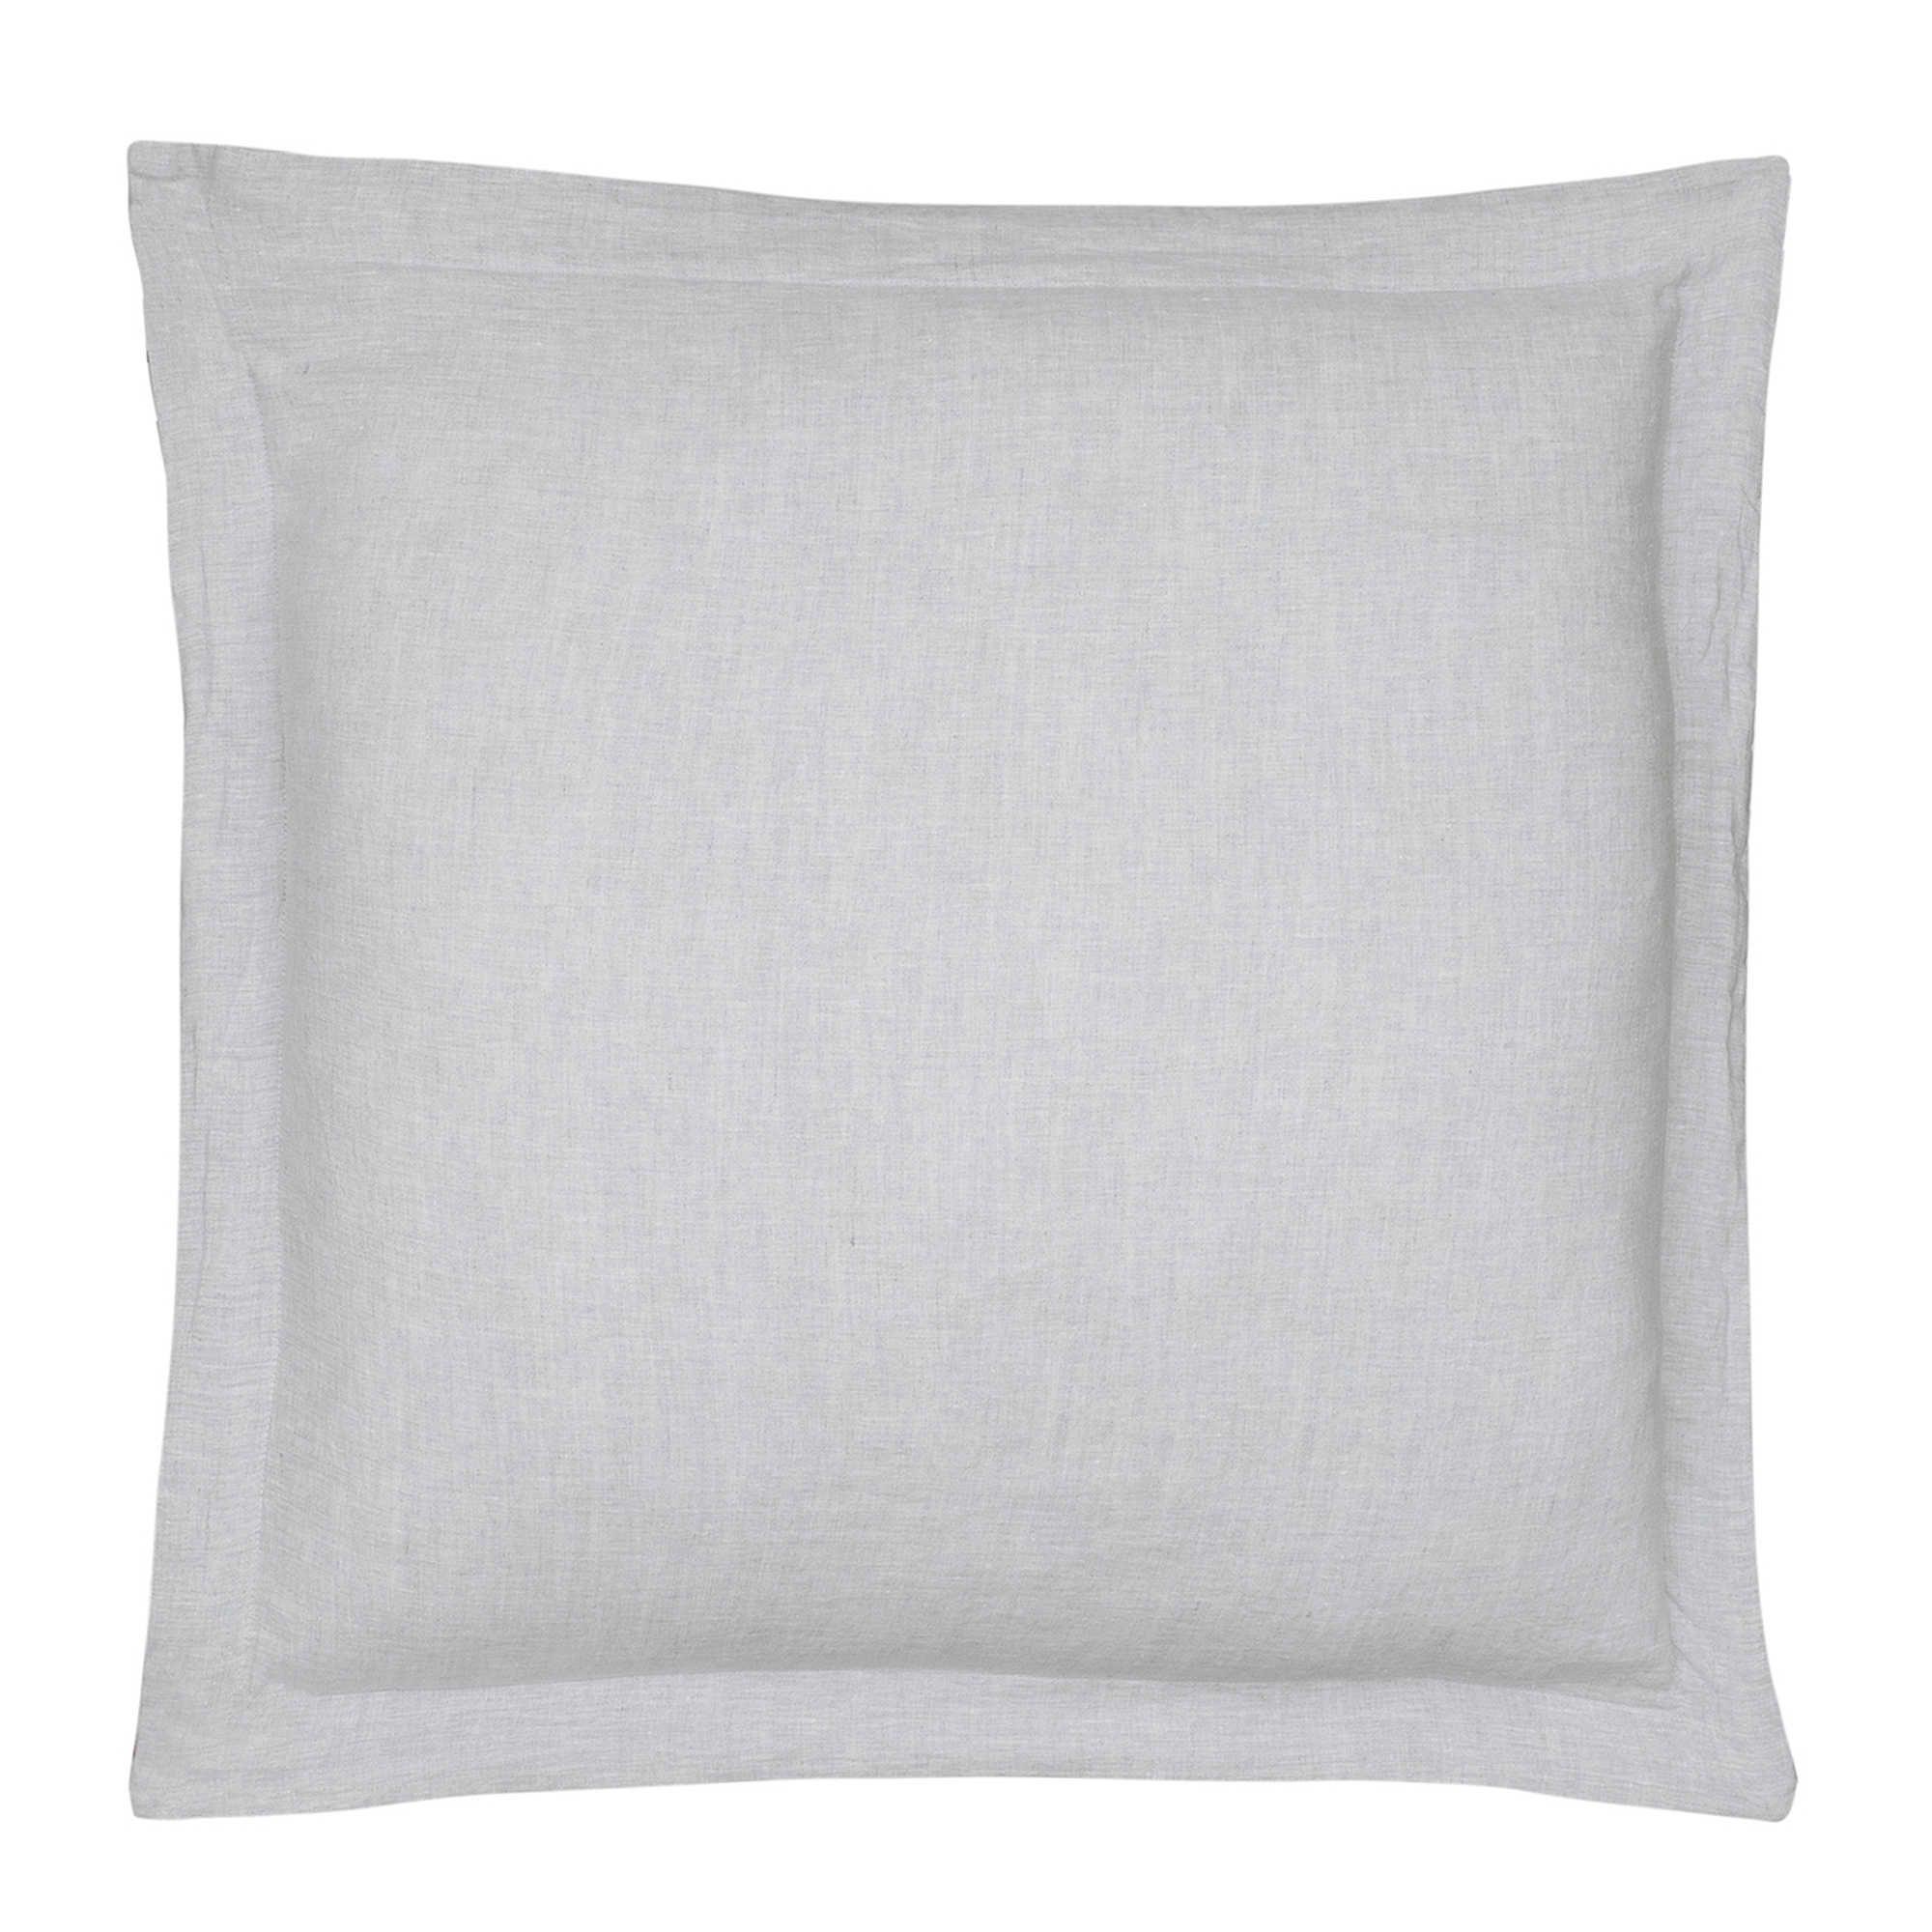 Levtex Home Washed Linen European Pillow Sham In Light Grey